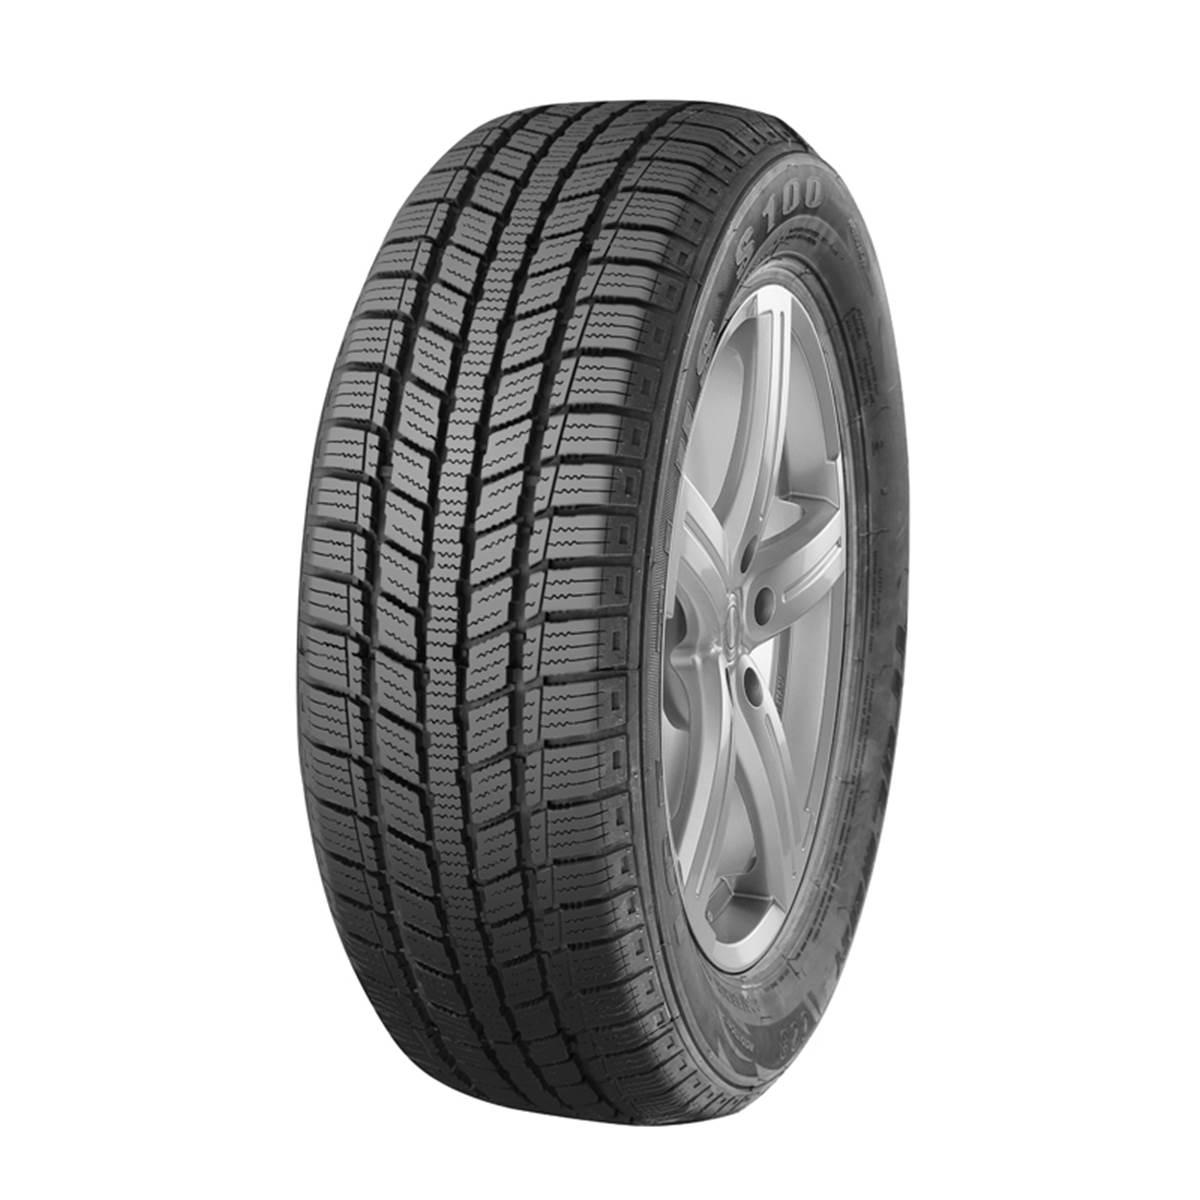 tracmax non class s achat de pneus tracmax non class s pas cher comparer les prix du pneu. Black Bedroom Furniture Sets. Home Design Ideas